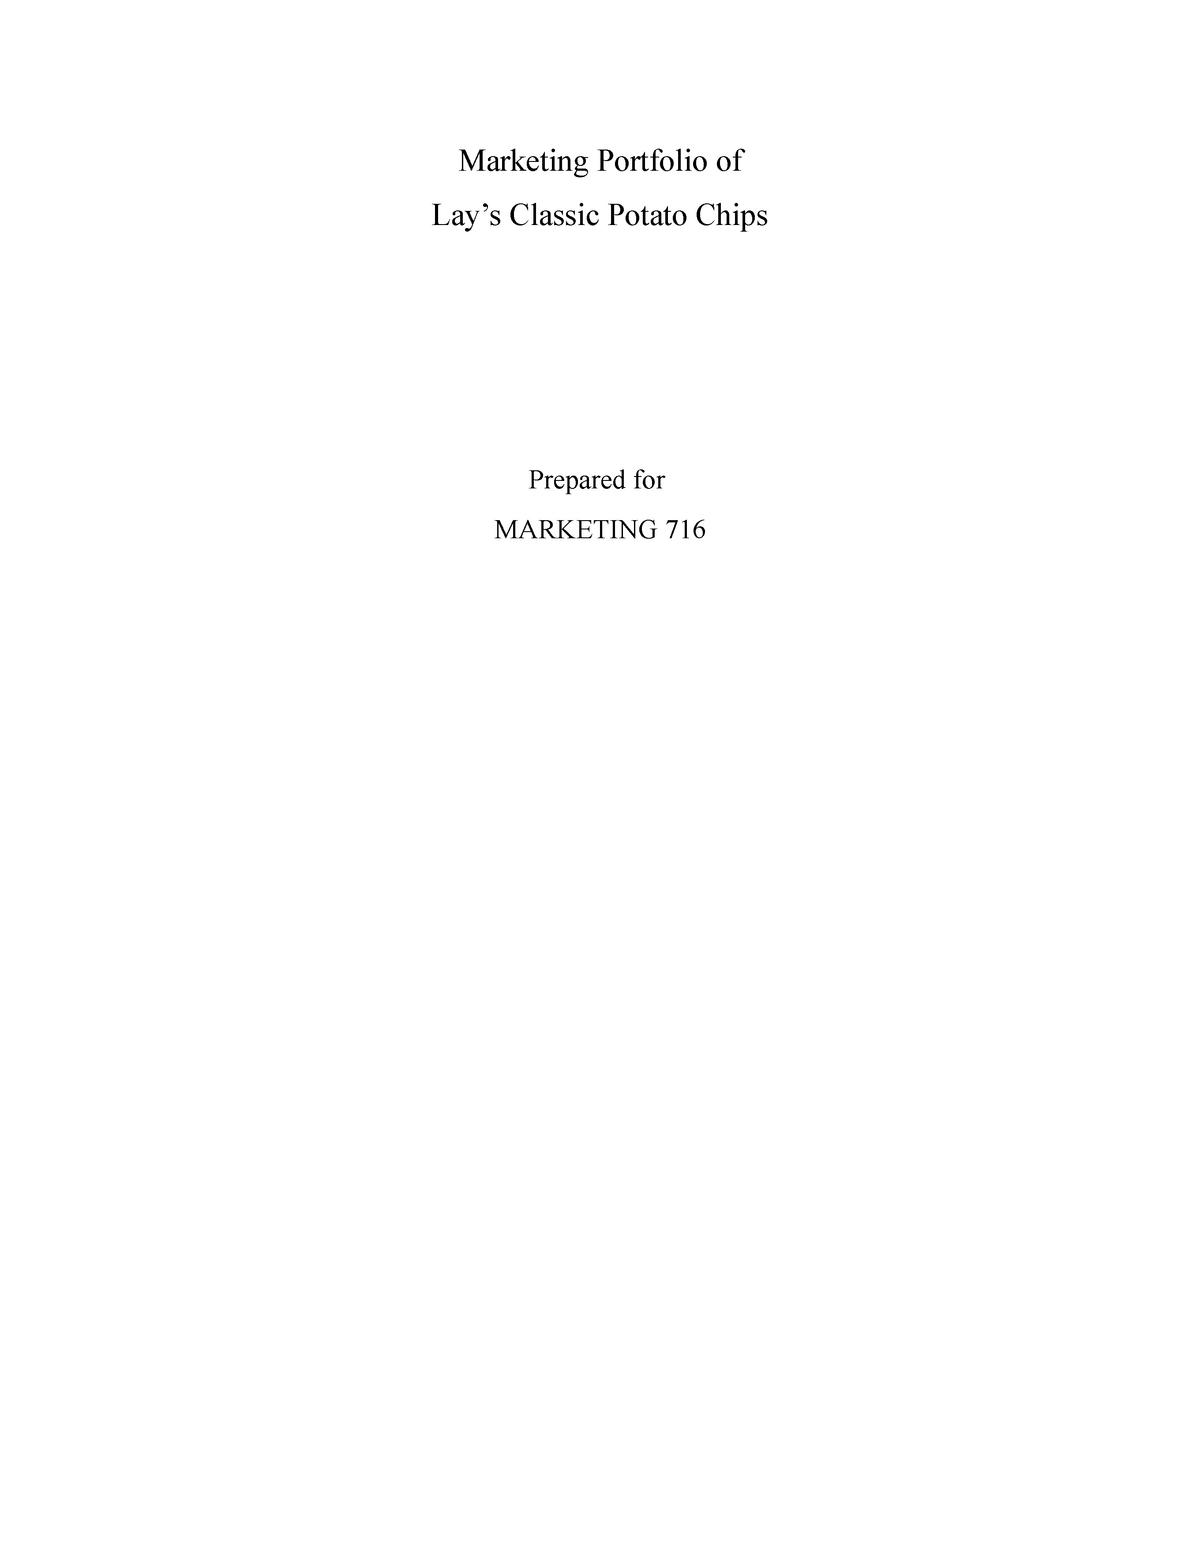 Marketing portfolio of Lays chips - MKTG716: Marketing - StuDocu